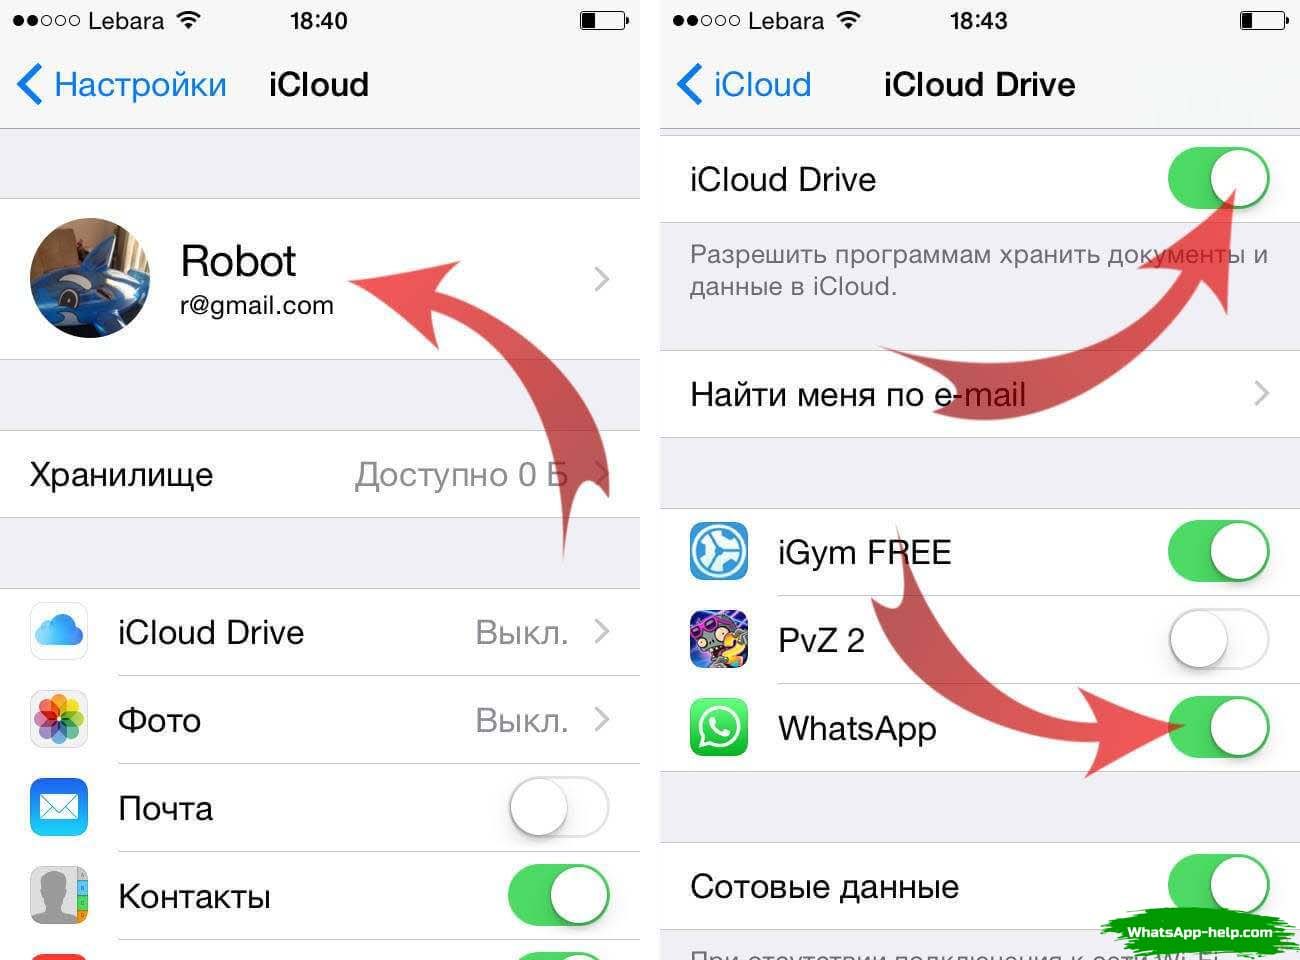 можно ли восстановить удаленную переписку в whatsapp